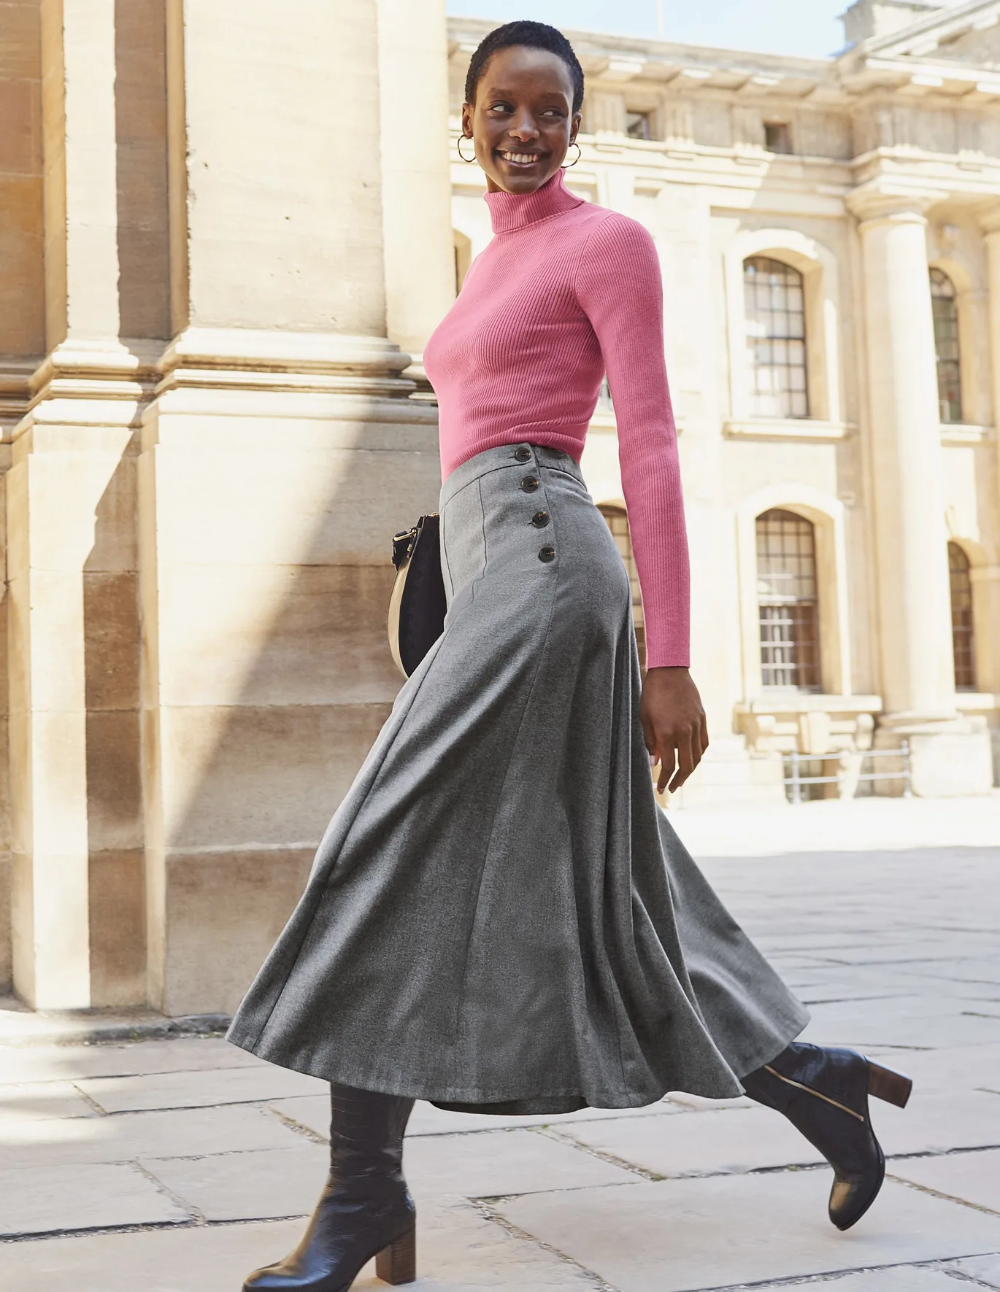 Esme British Tweed Midi Skirt - Grey Melange #mittellangeröcke Esme British Tweed Midi Skirt - Grey Melange #mittellangeröcke